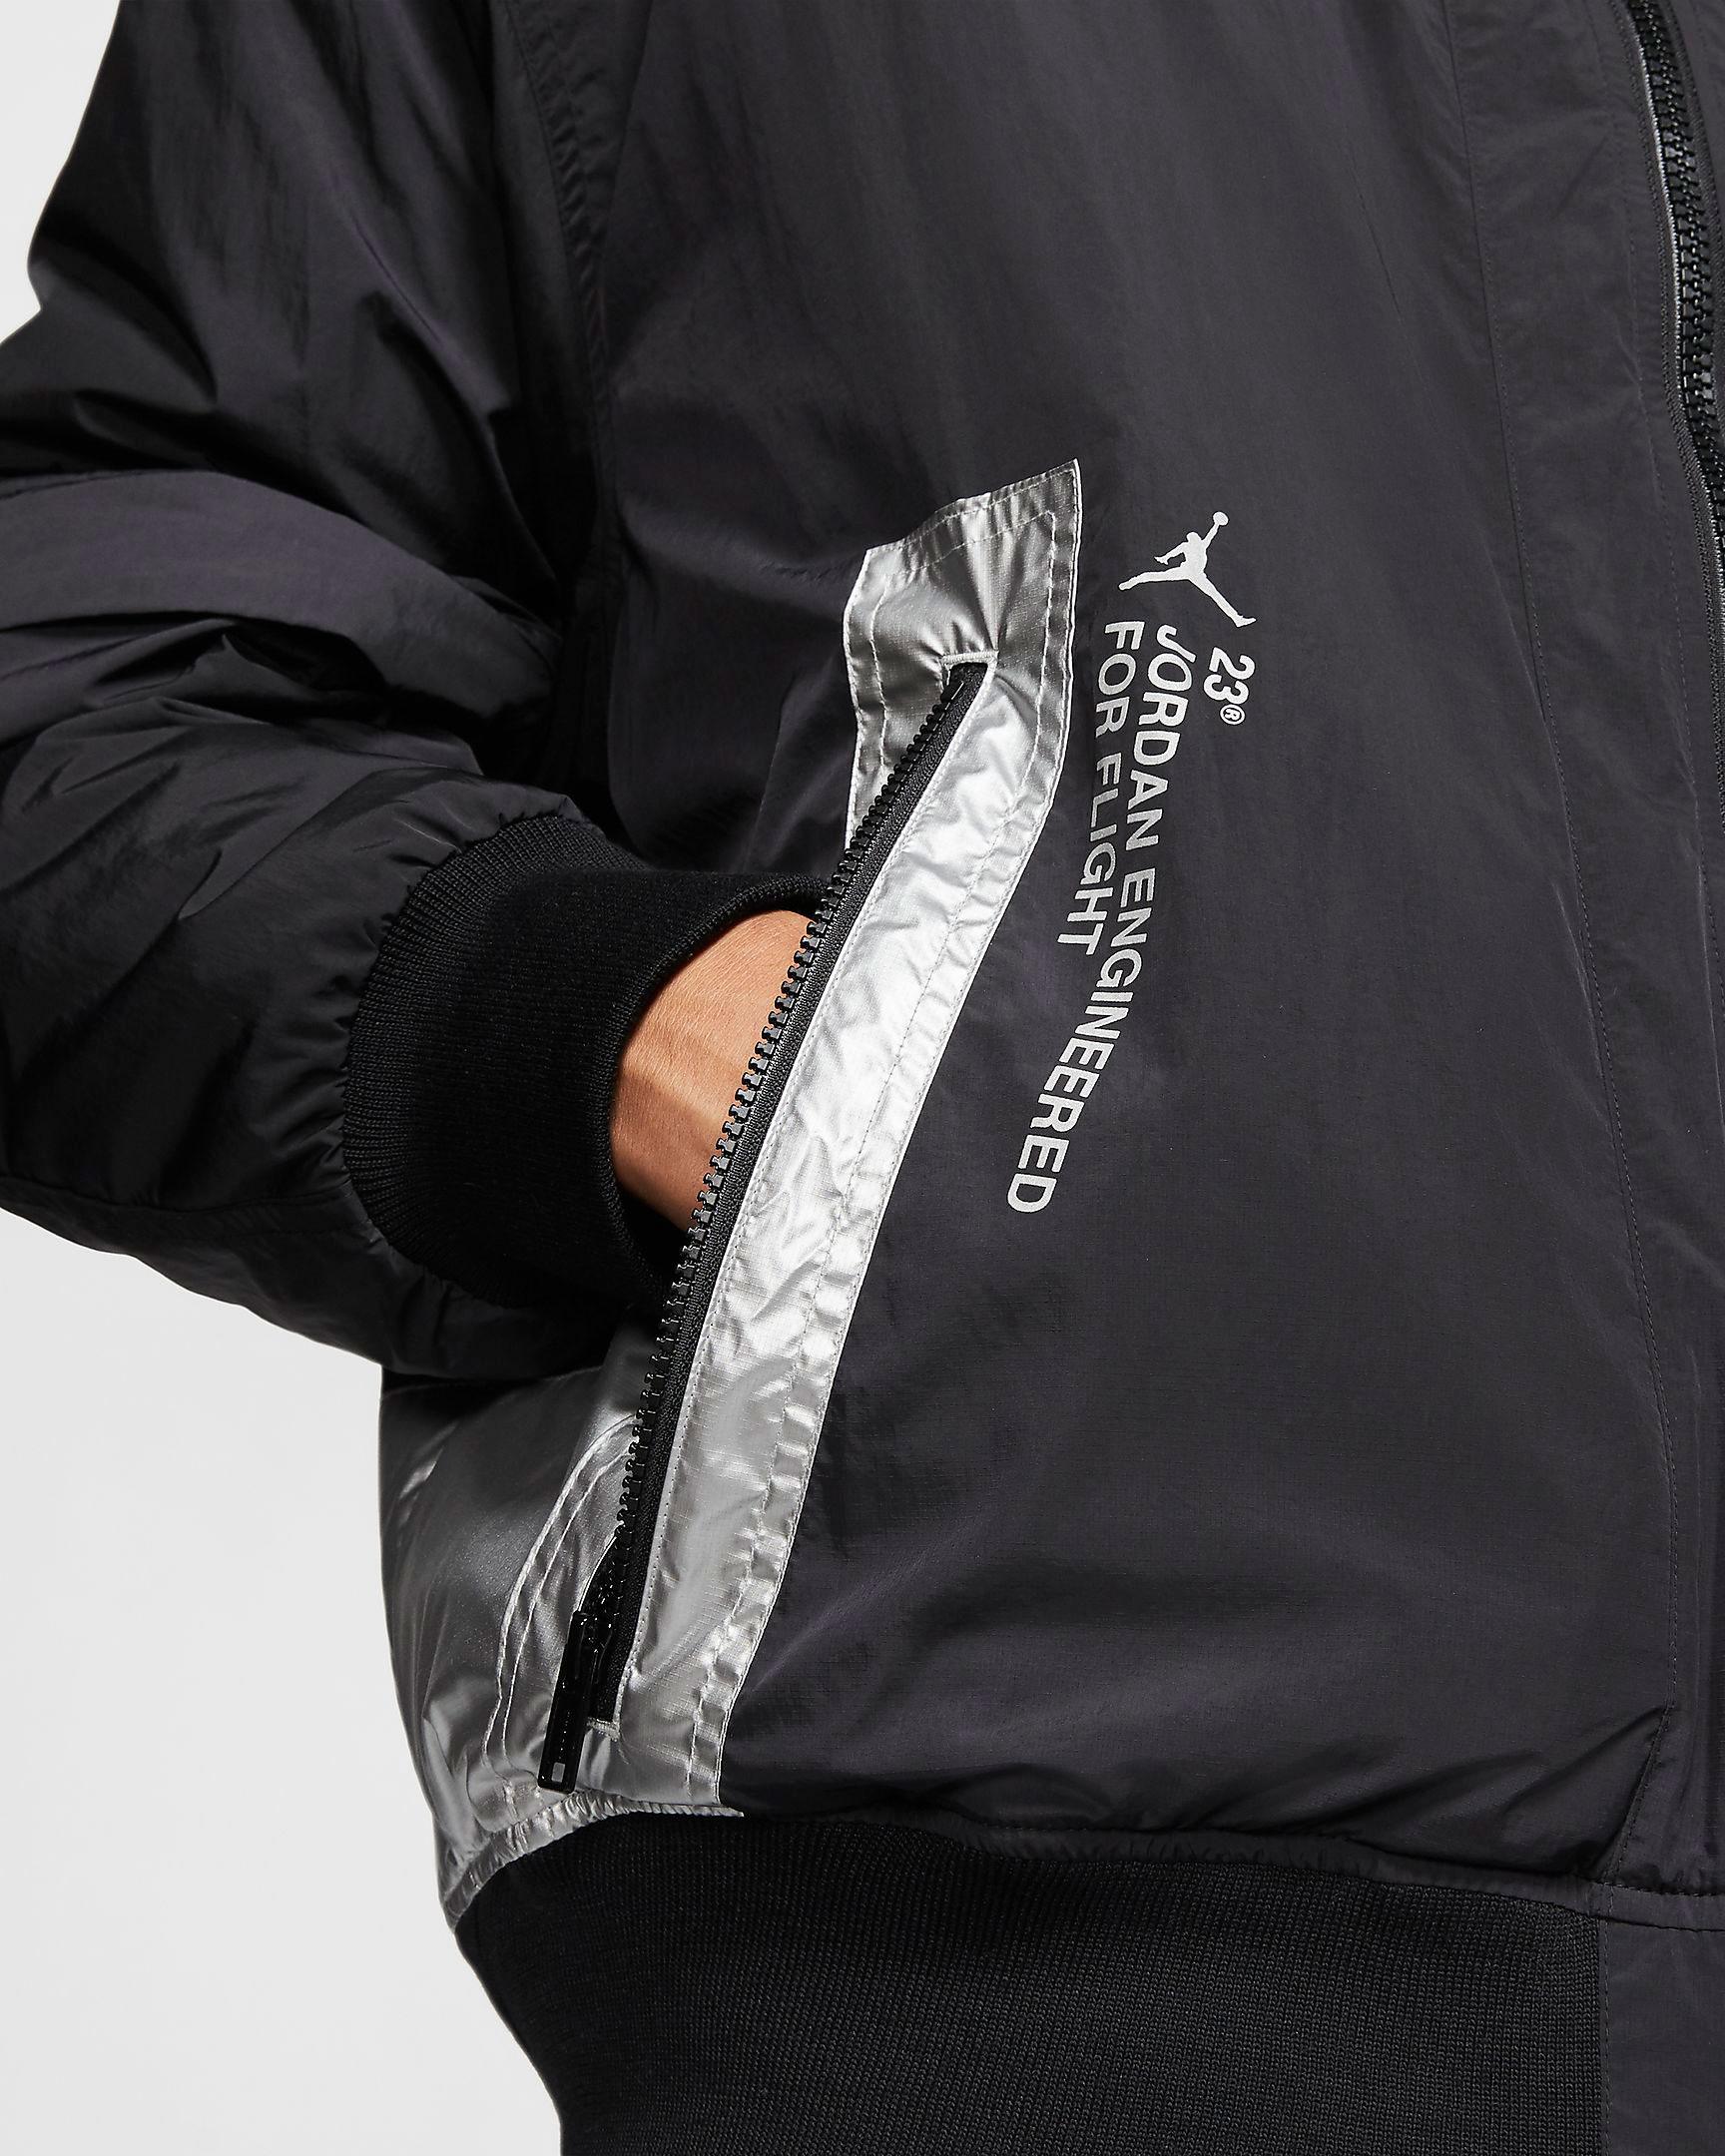 jordan-23-engineered-ma1-down-jacket-black-silver-7